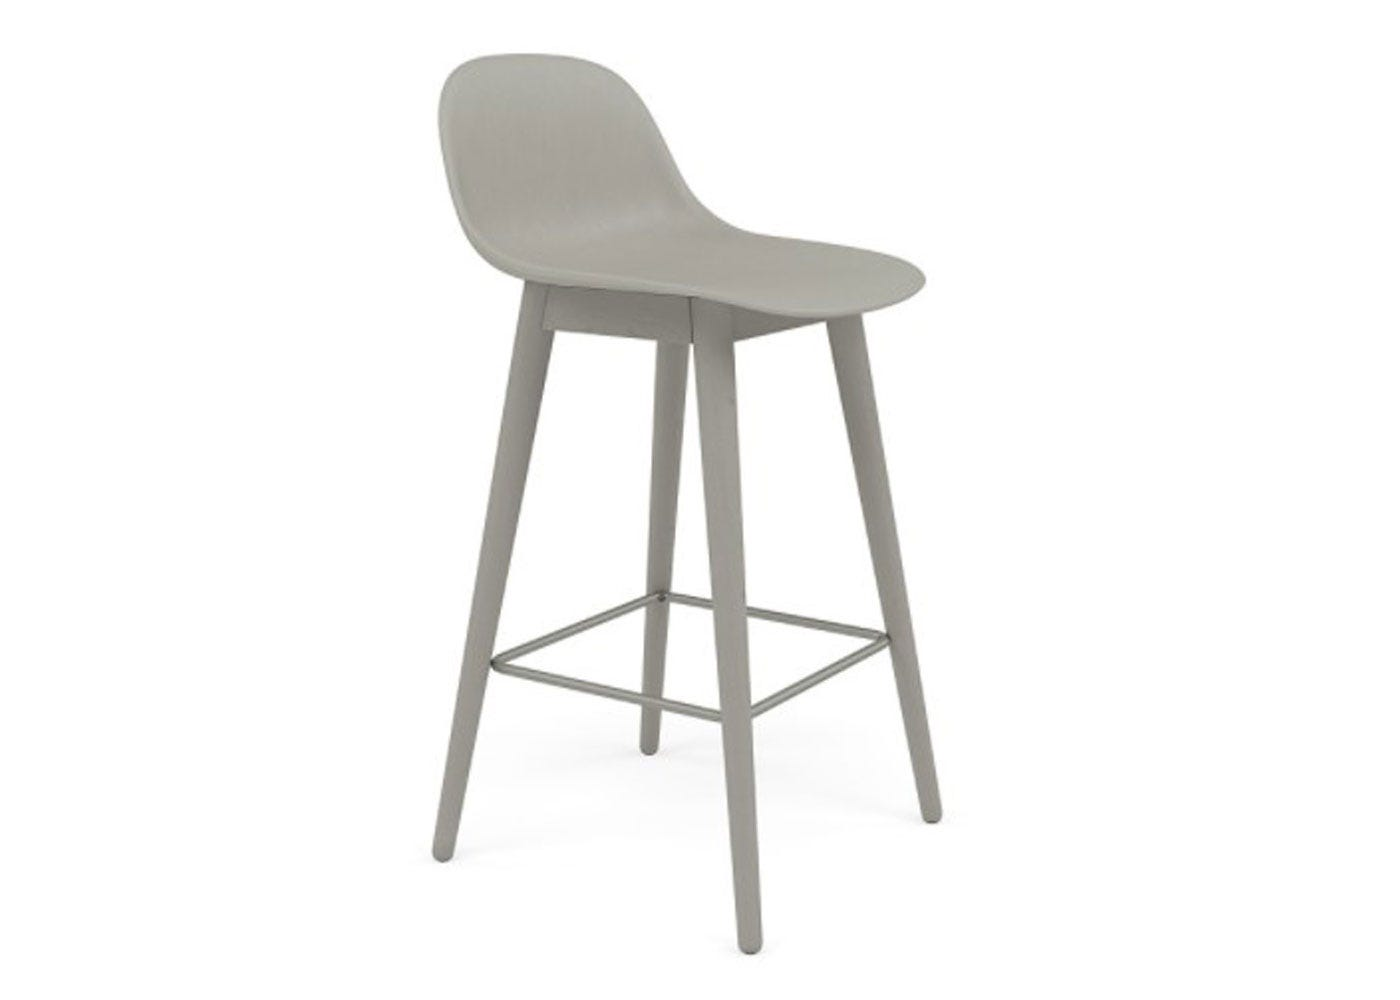 Fiber Counter Stool With Backrest Wooden Base Grey